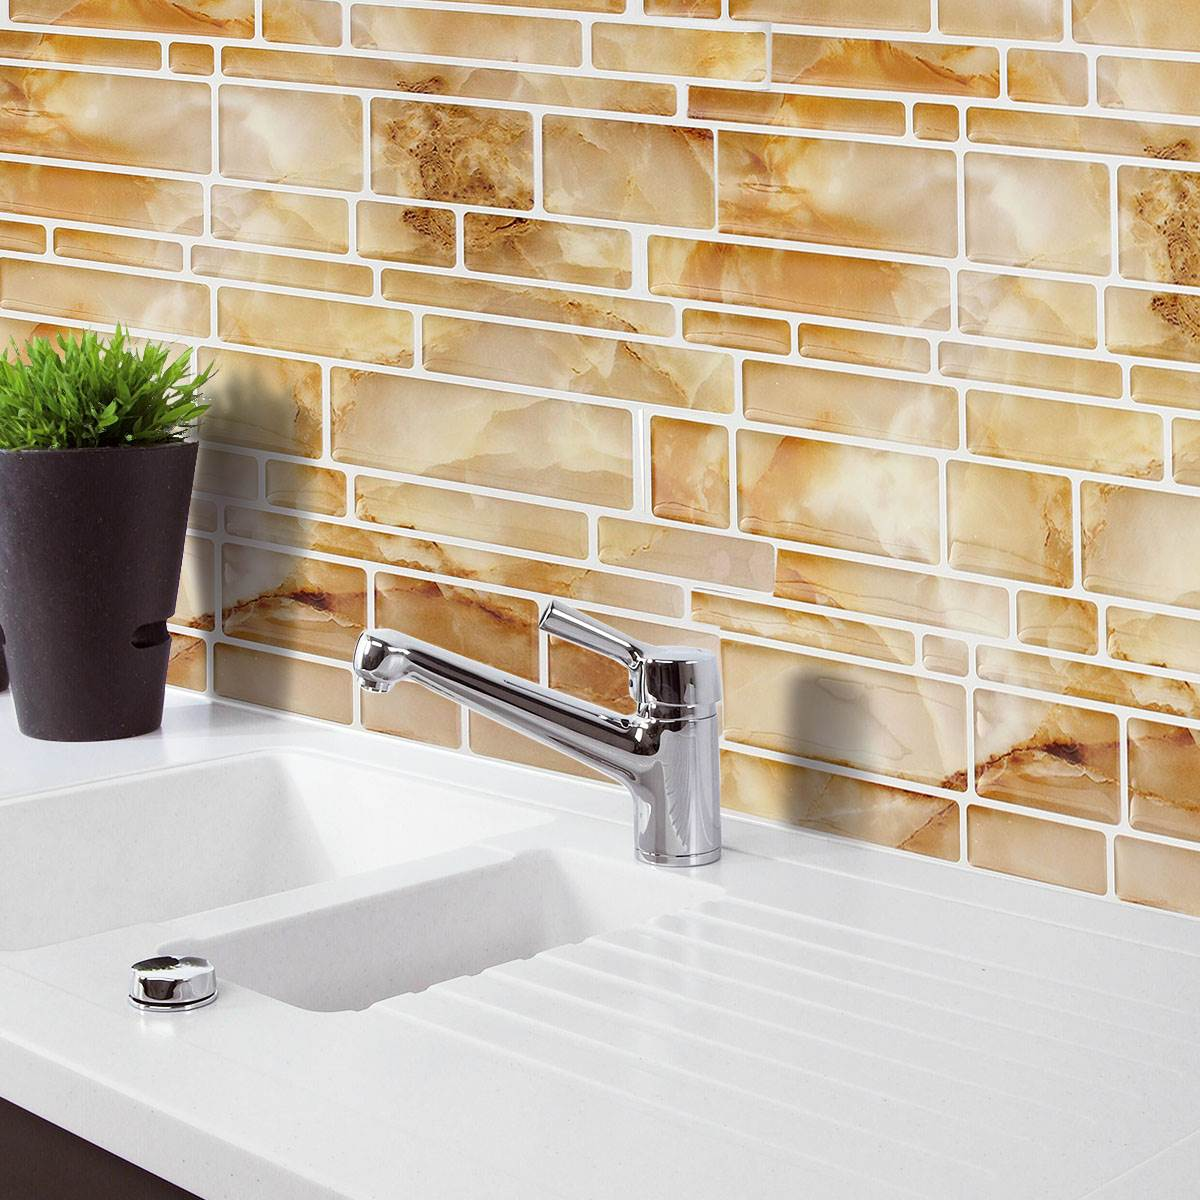 Best Kitchen Gallery: Yellow Imitation Marble Home Decor Brick Tile Kitchen Bathroom Foil of Foil Kitchen Tile on rachelxblog.com